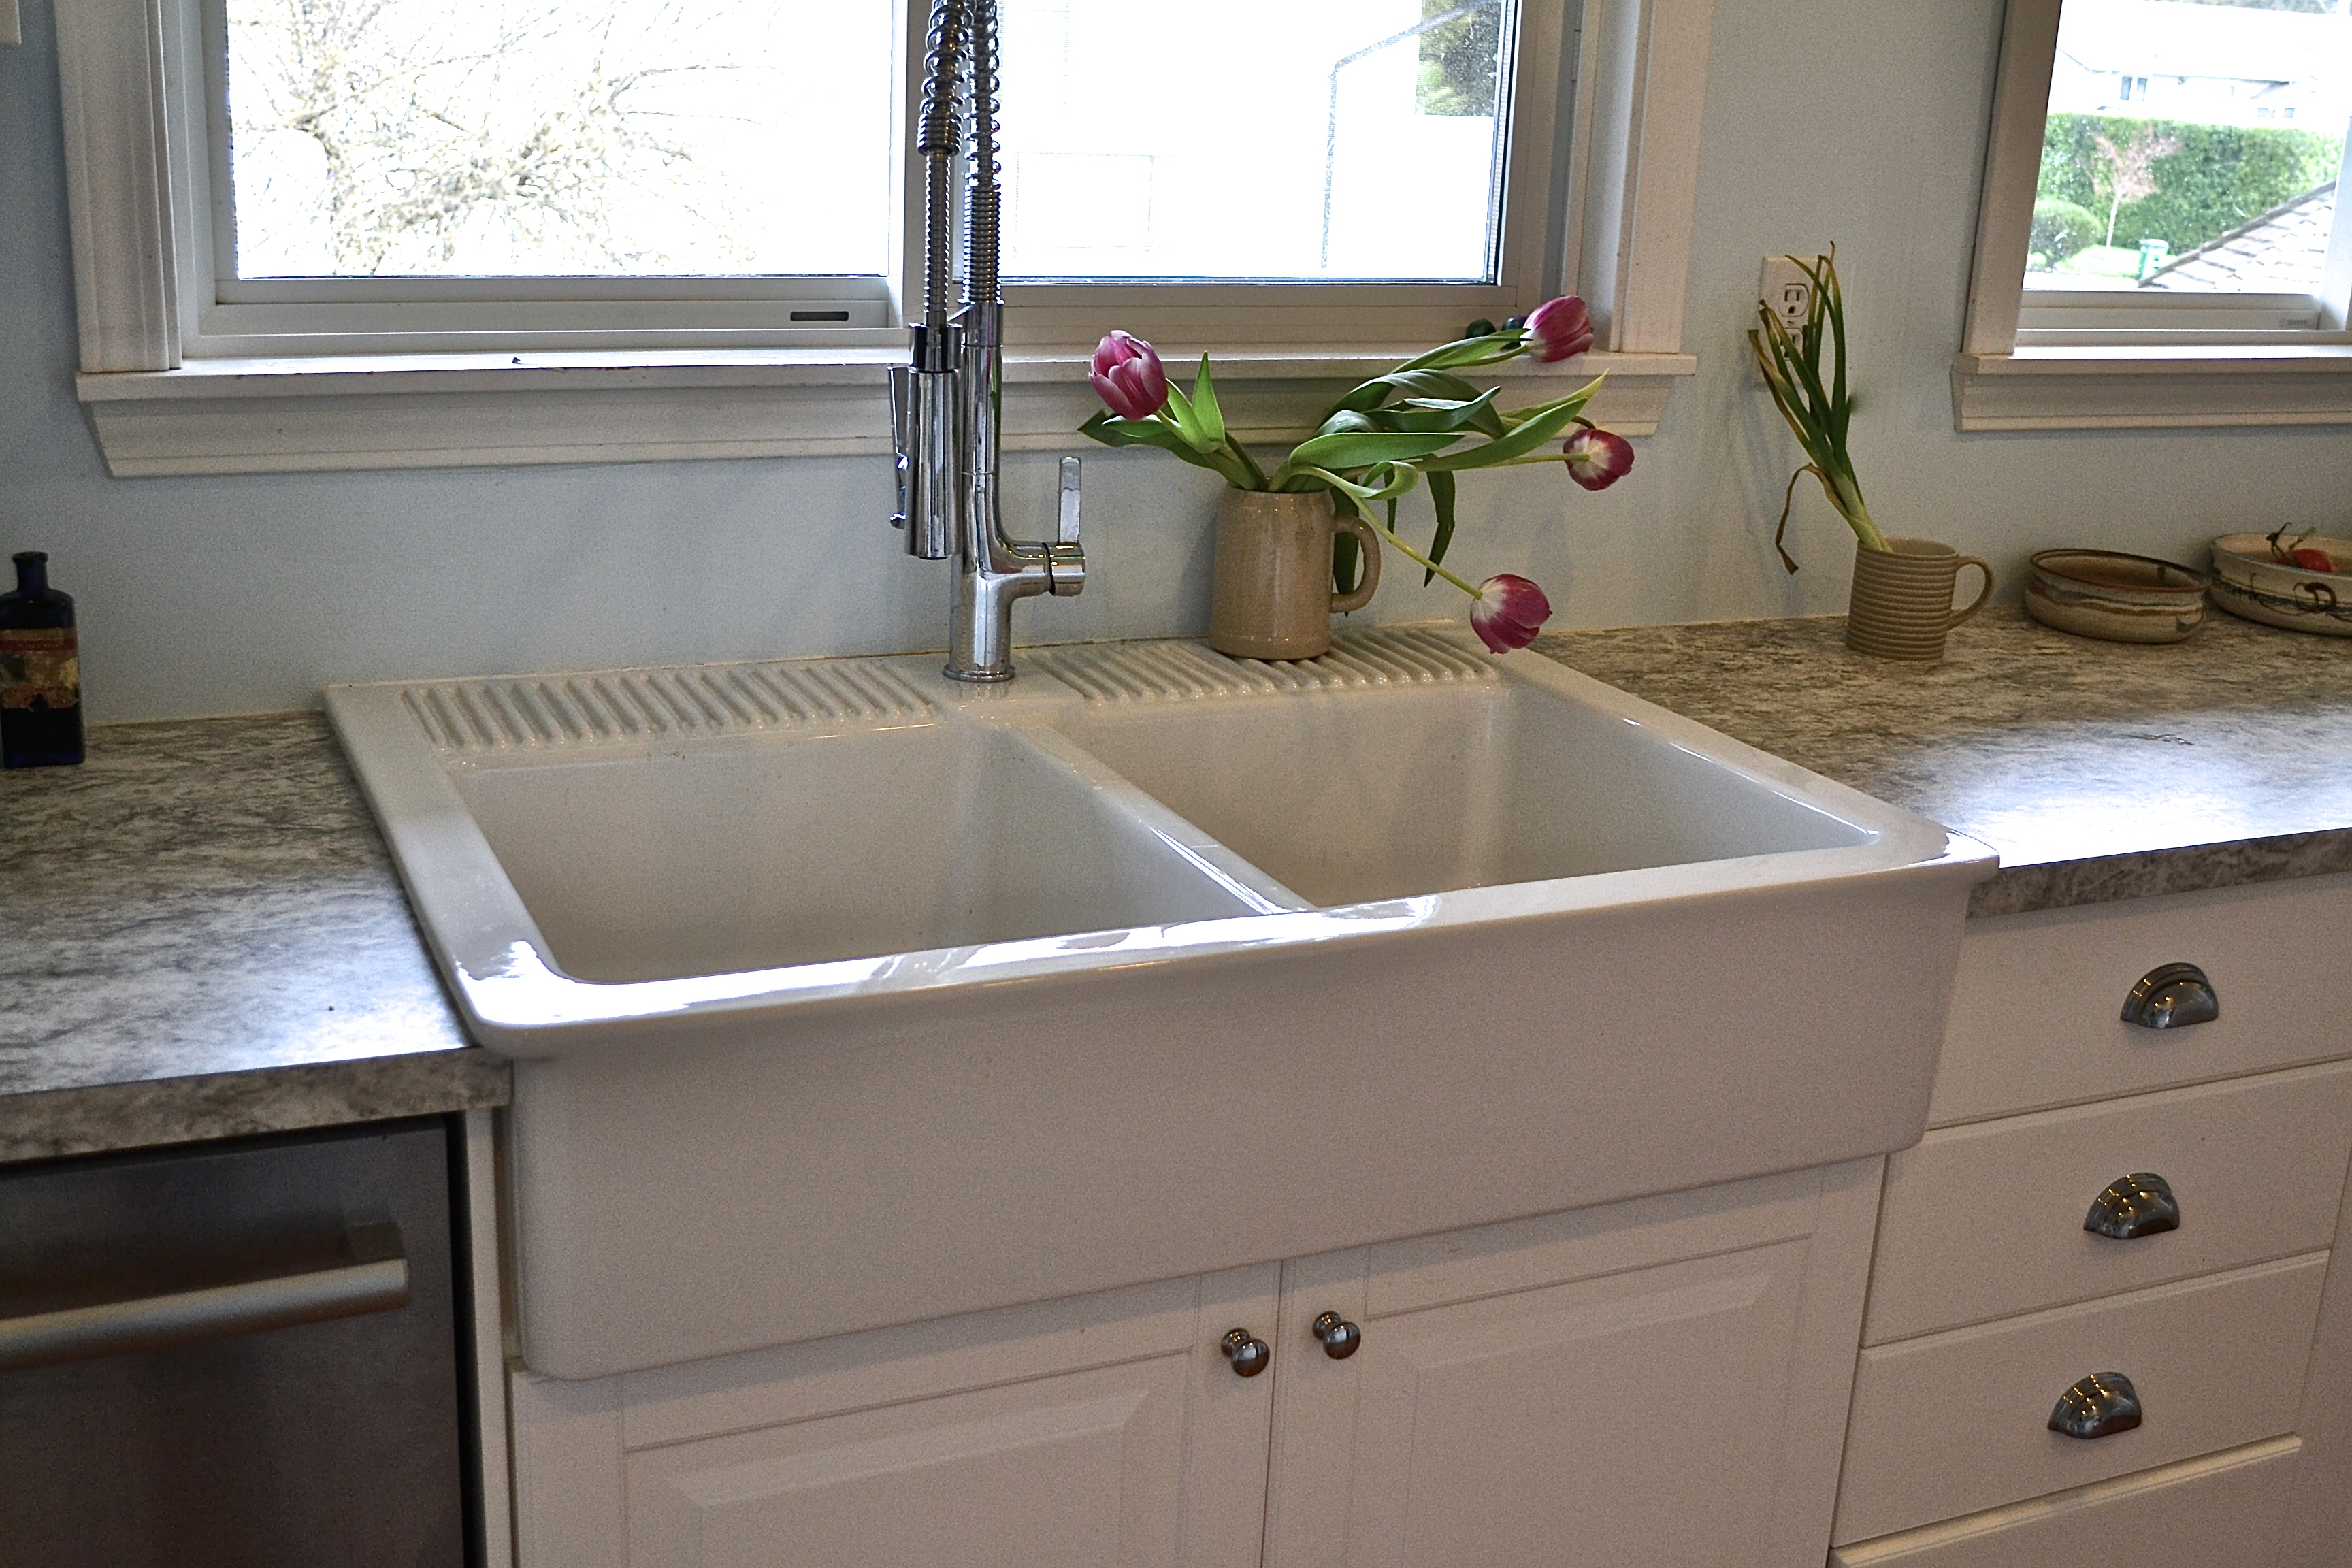 White apron front sink ikea -  2015 02 11 17 38 33 The Beautiful Farmhouse Sink